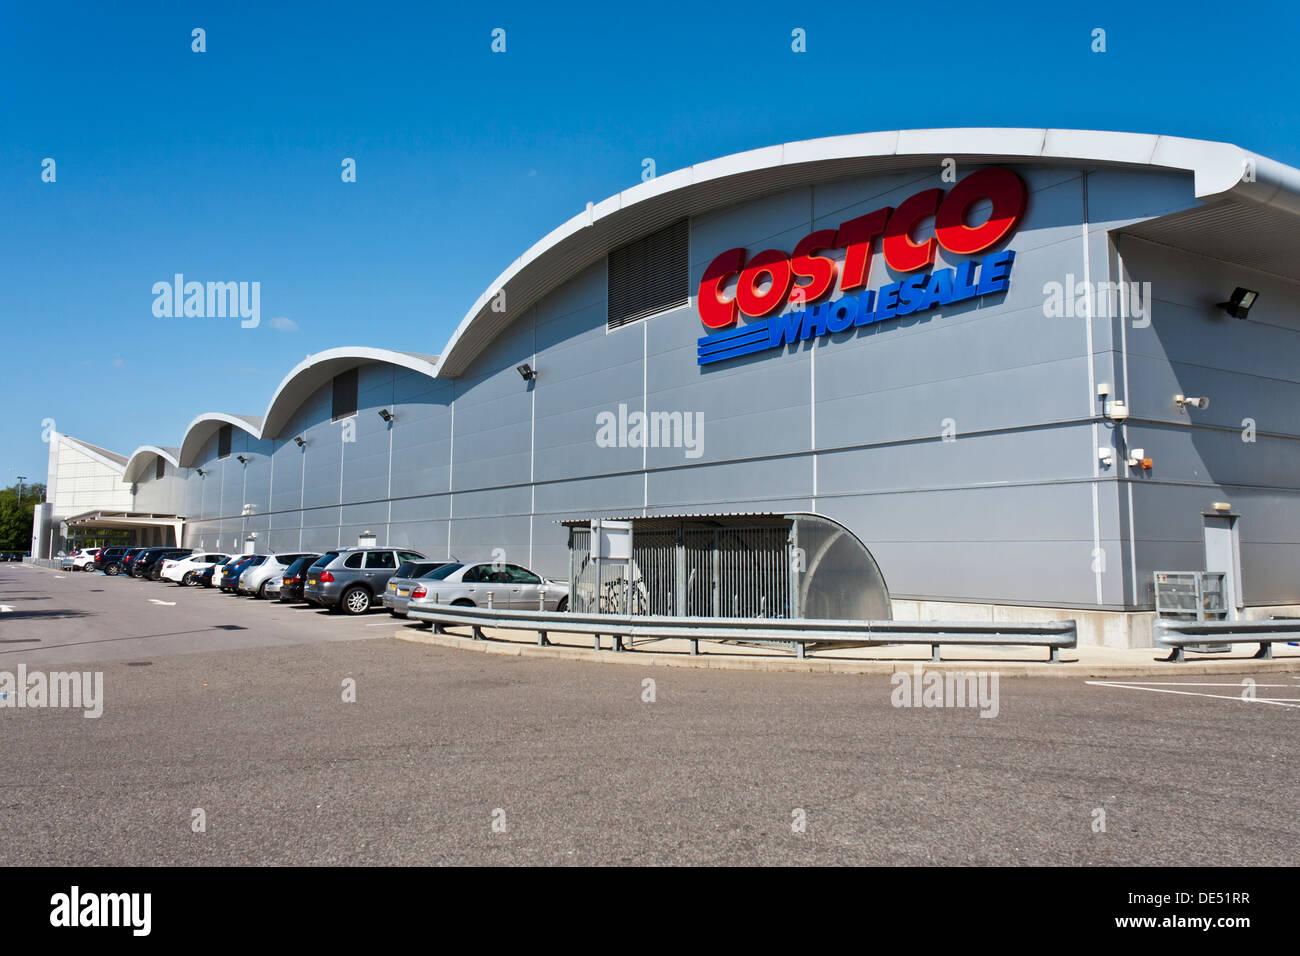 1c274447b4 Costco Discount Stock Photos   Costco Discount Stock Images - Alamy